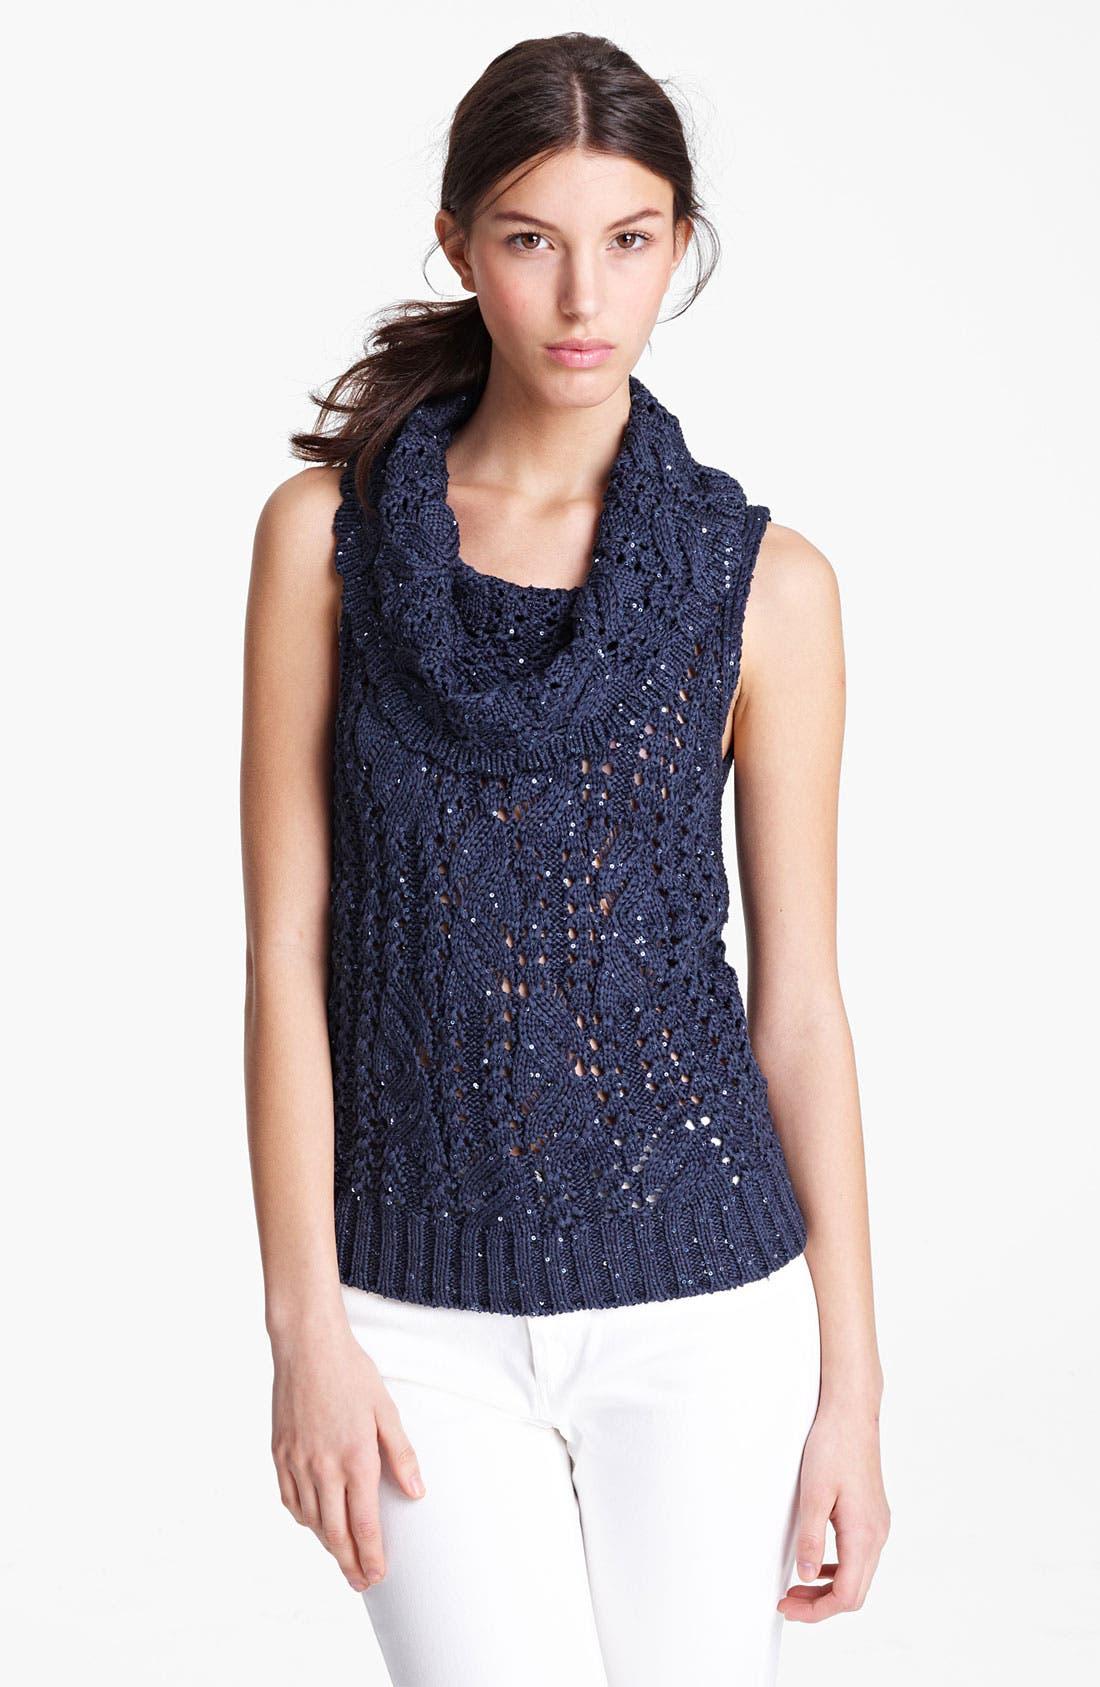 Alternate Image 1 Selected - Oscar de la Renta Sequin Knit Top